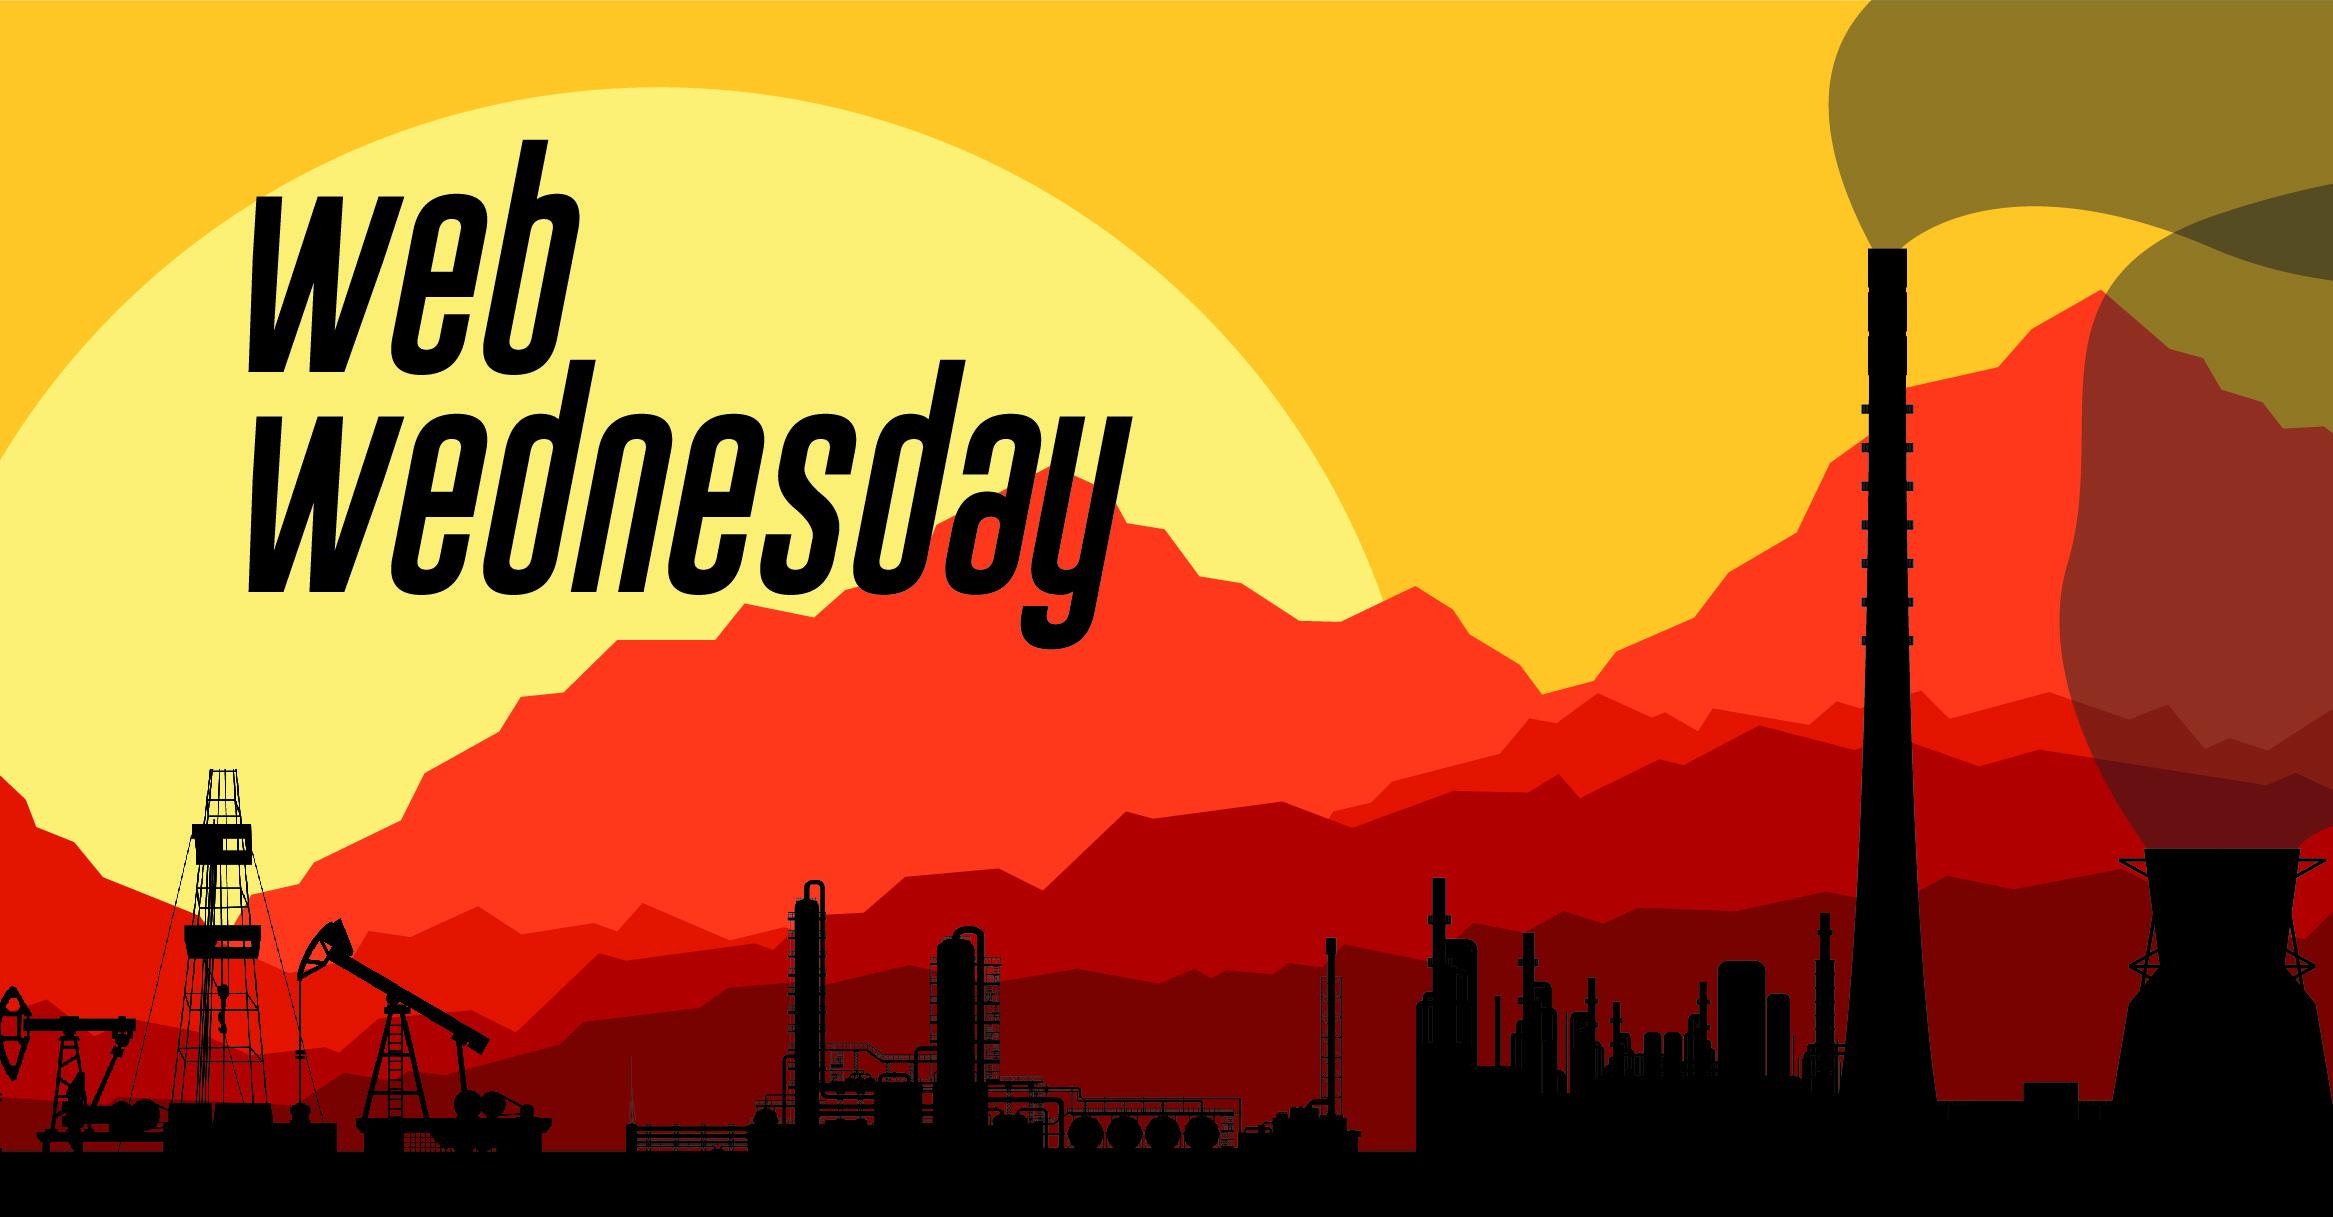 THM Web Wednesday - August 24, 2016